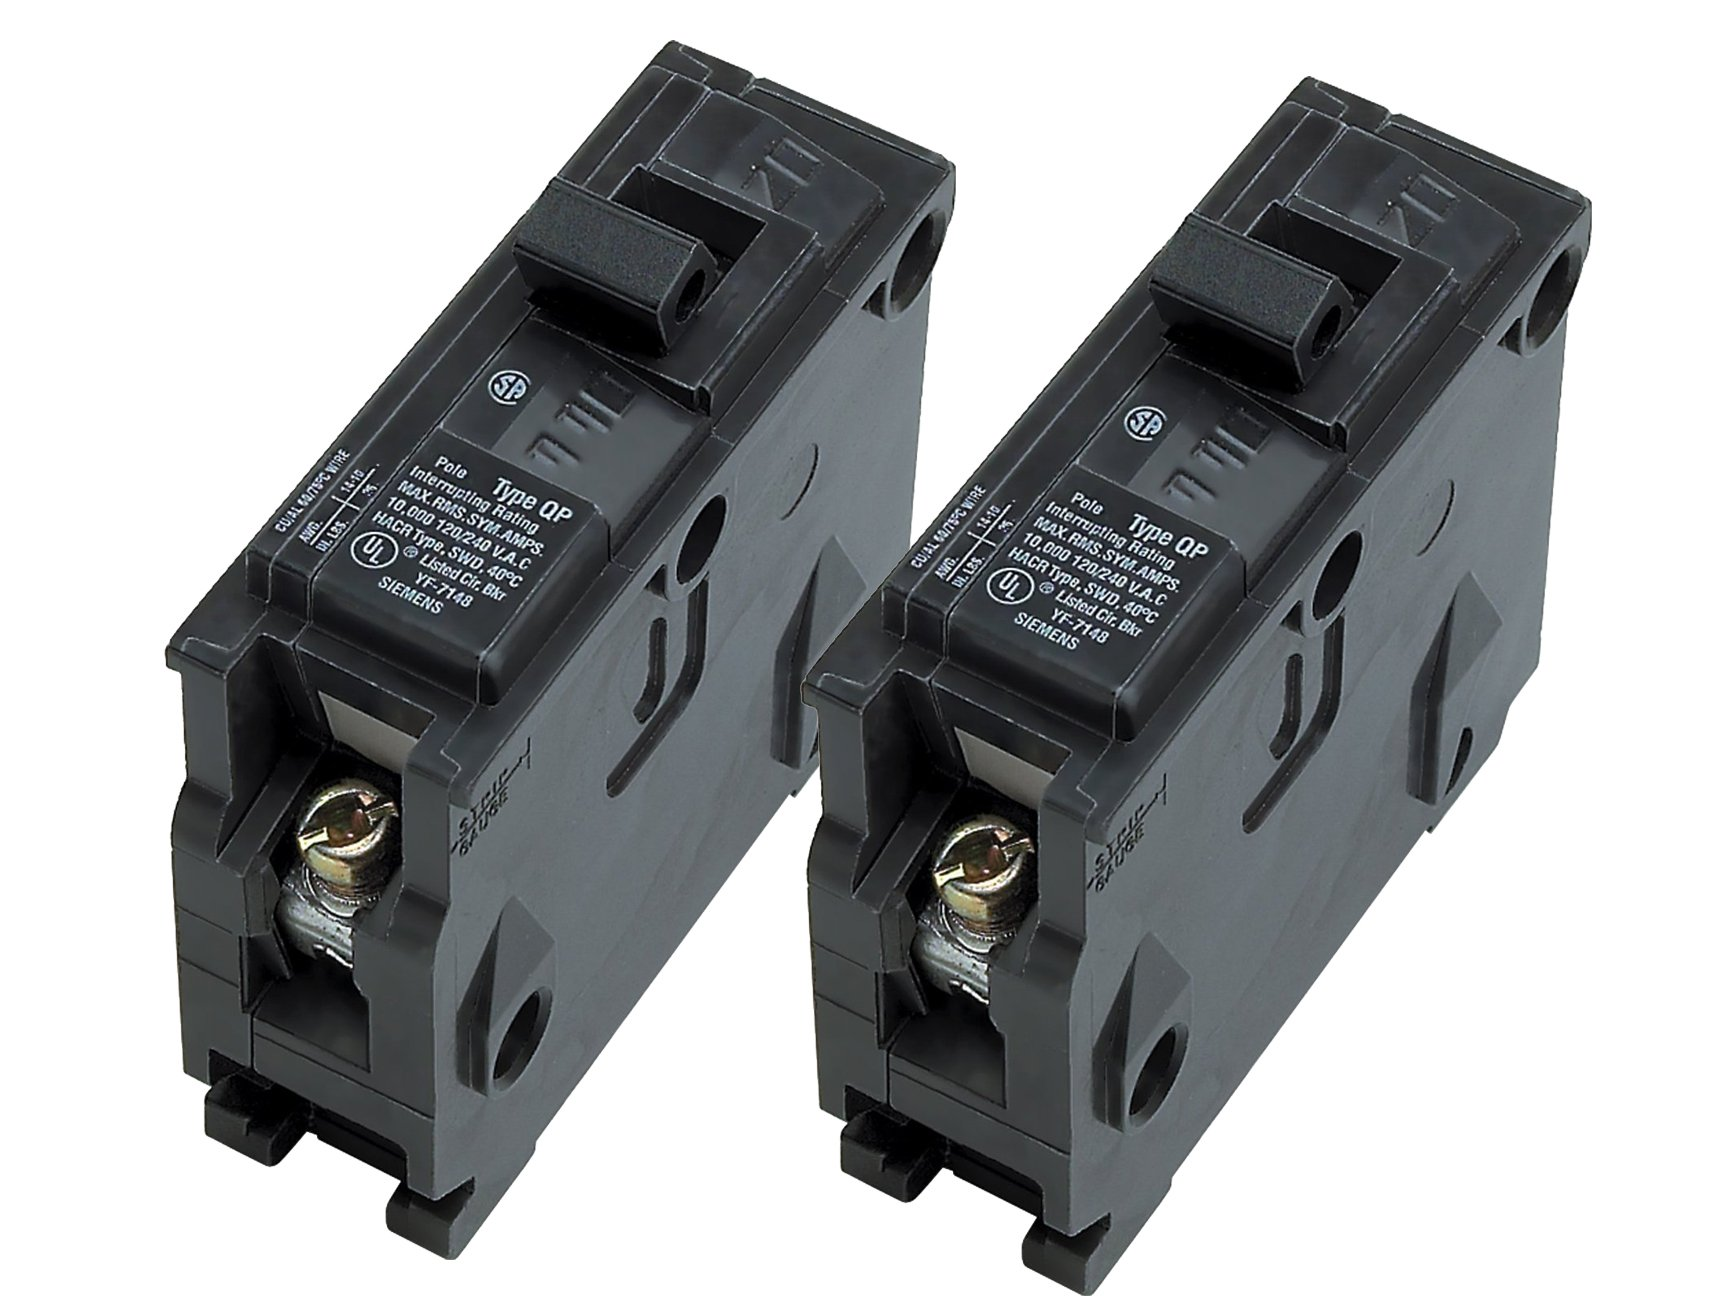 Siemens Q130 30-Amp 1 Pole 120-Volt Circuit Breaker - 2 Pack